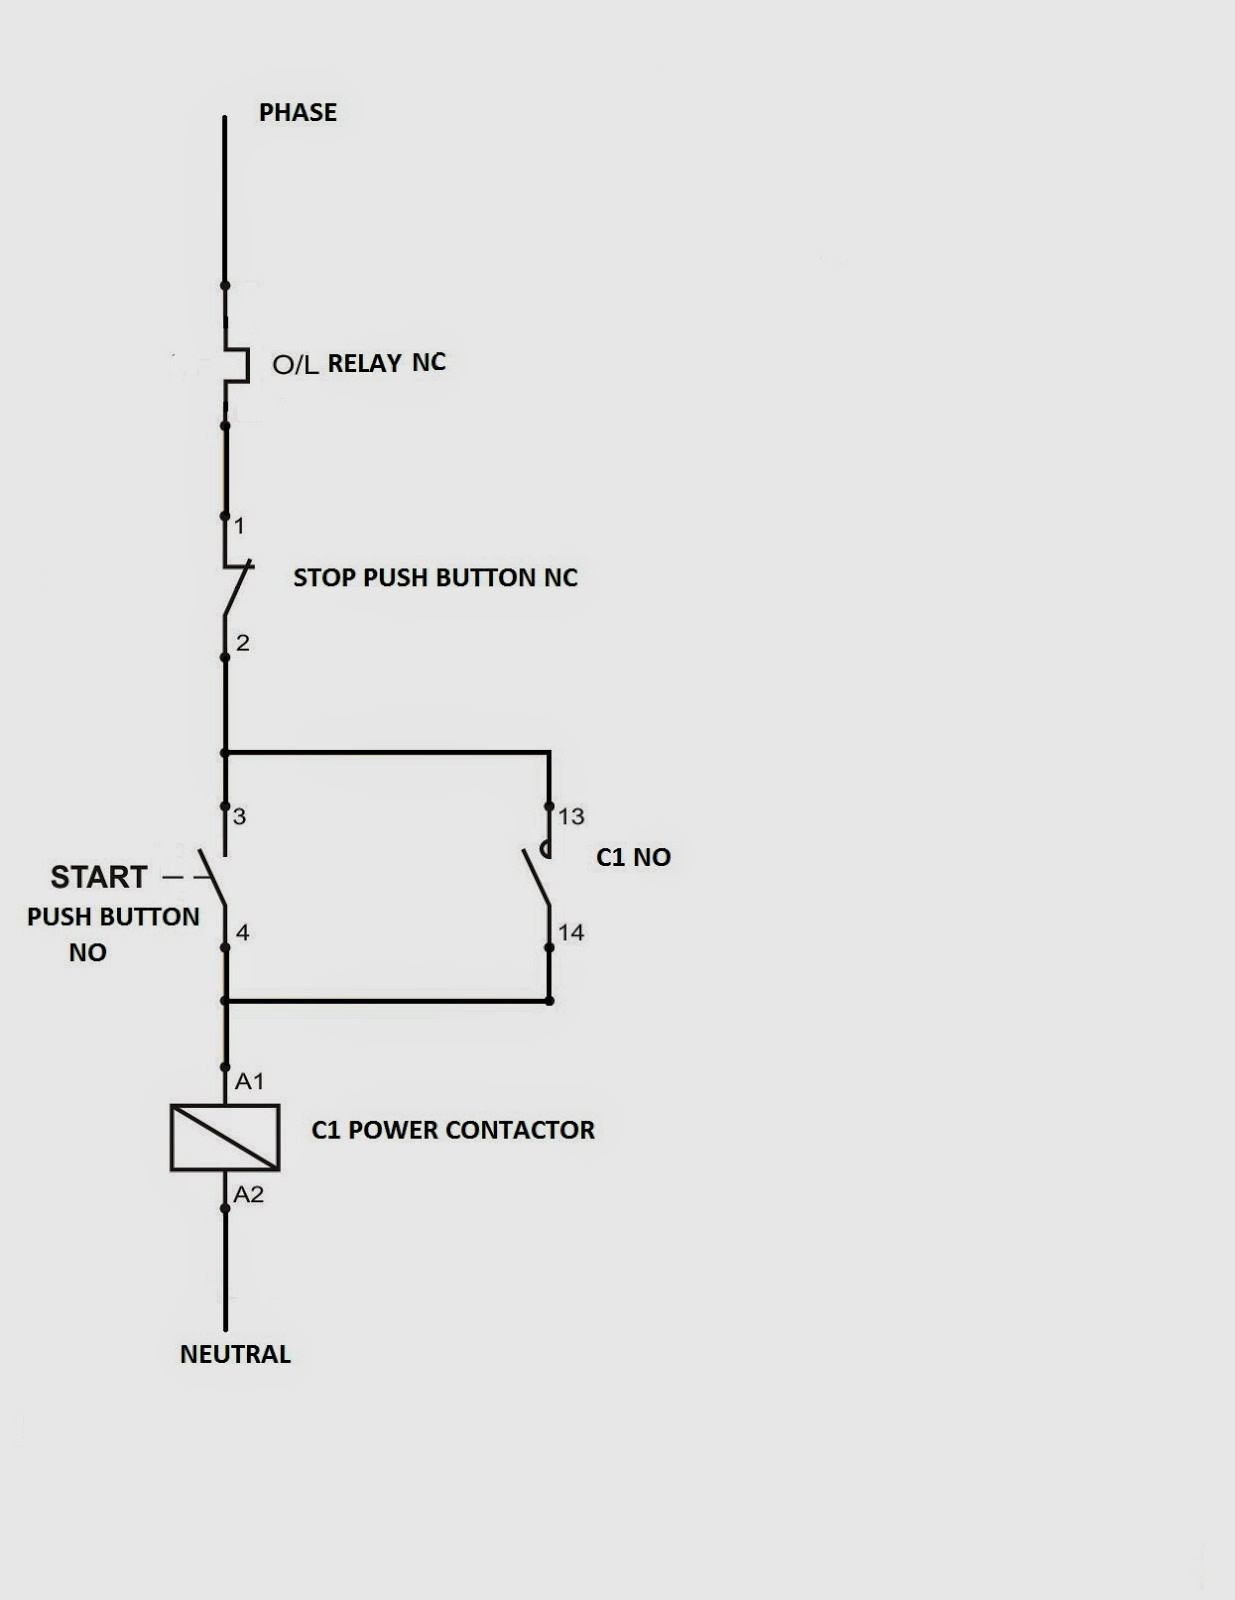 Star Delta Starter Control Circuit Diagram Wiring Image 5 Fig Dol